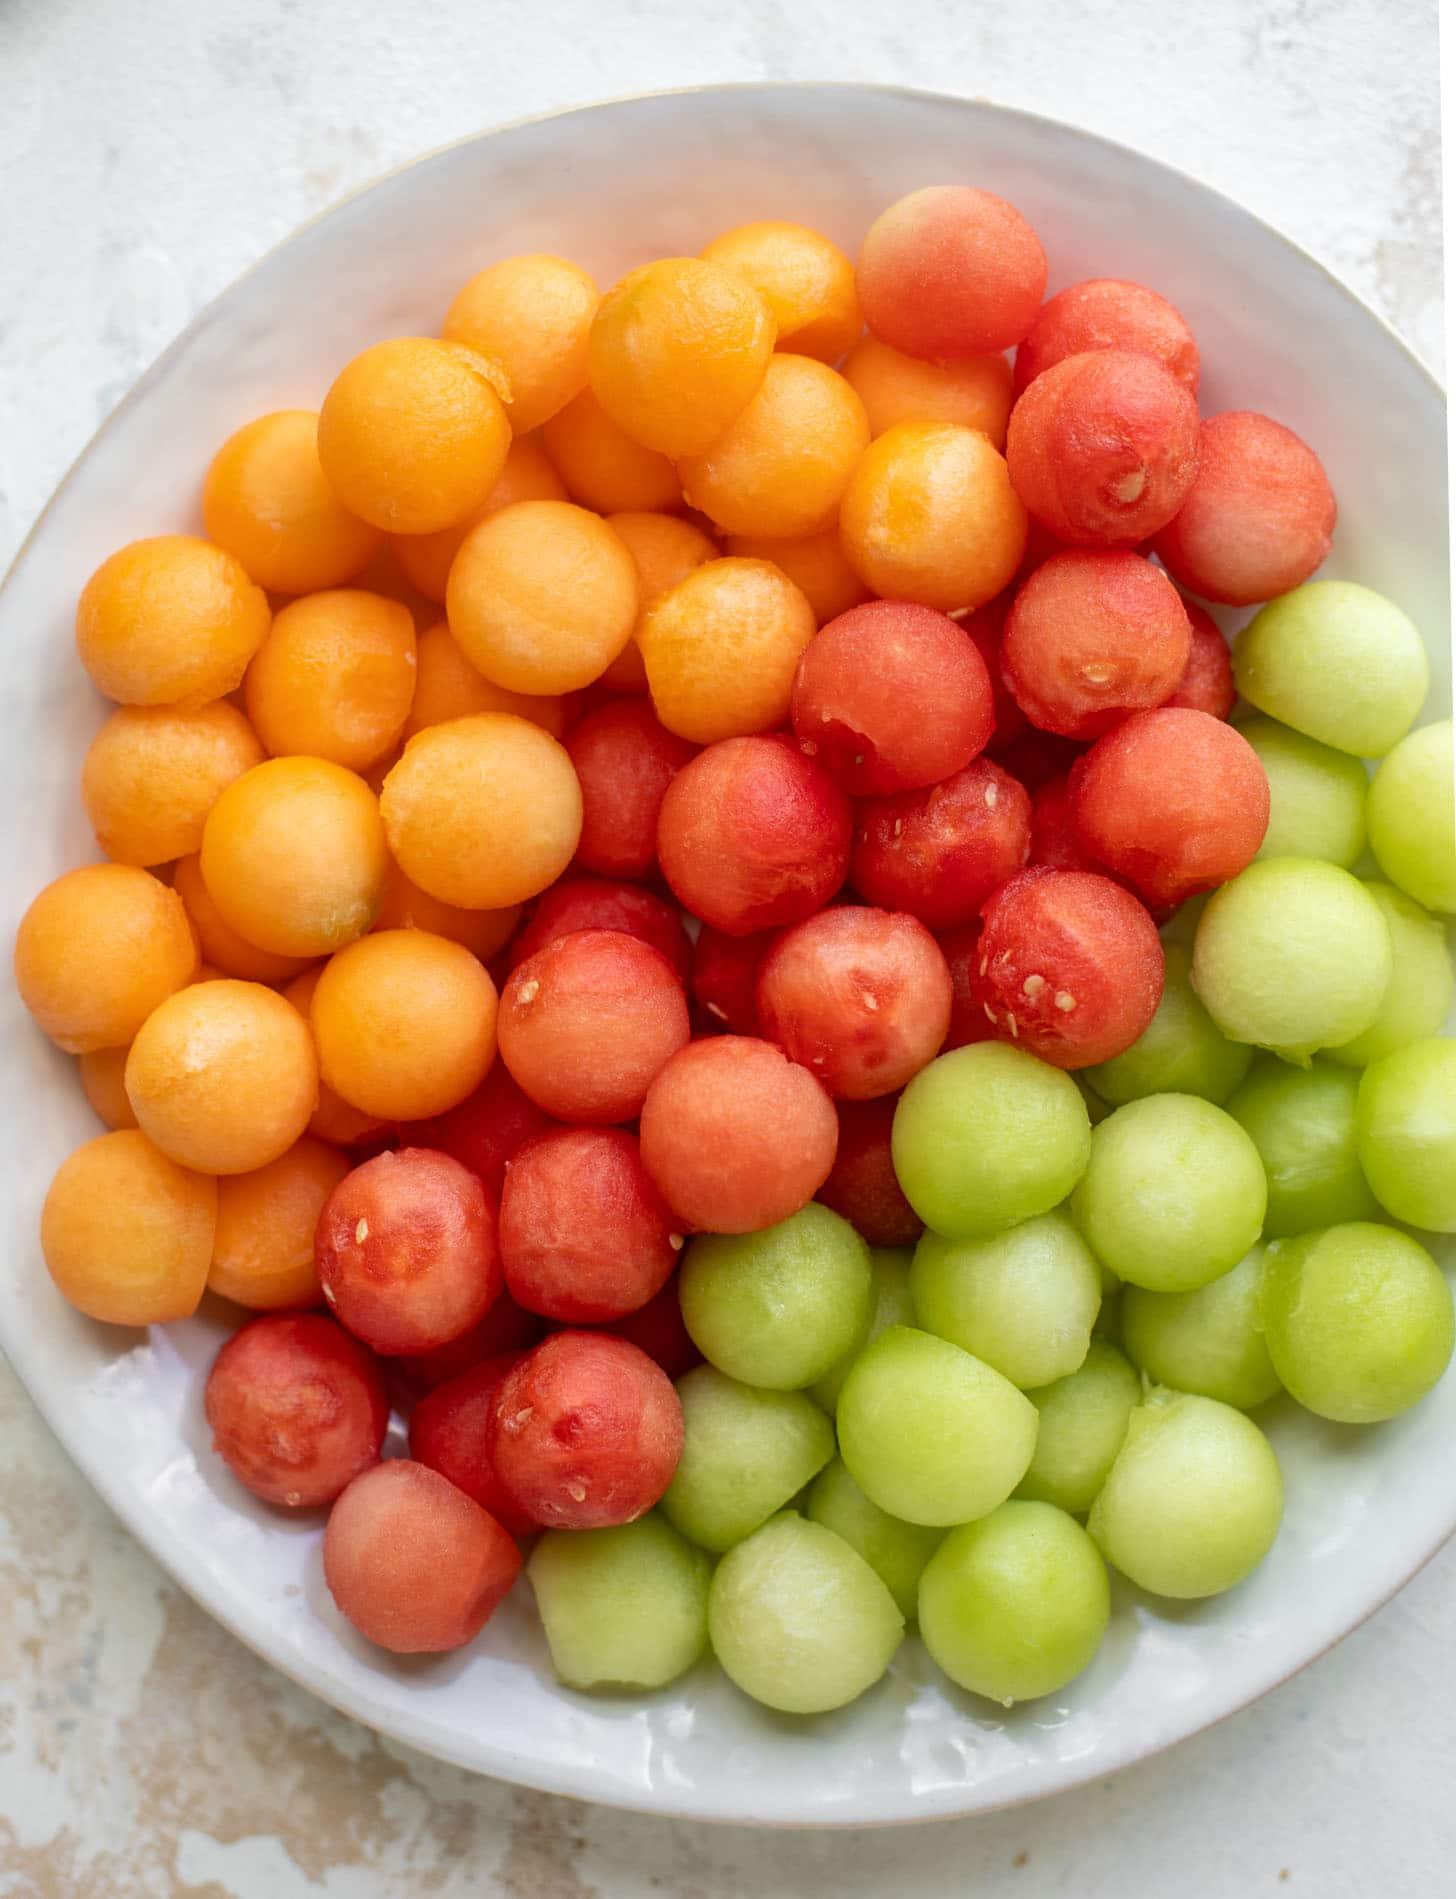 cantaloupe, watermelon, honeydew